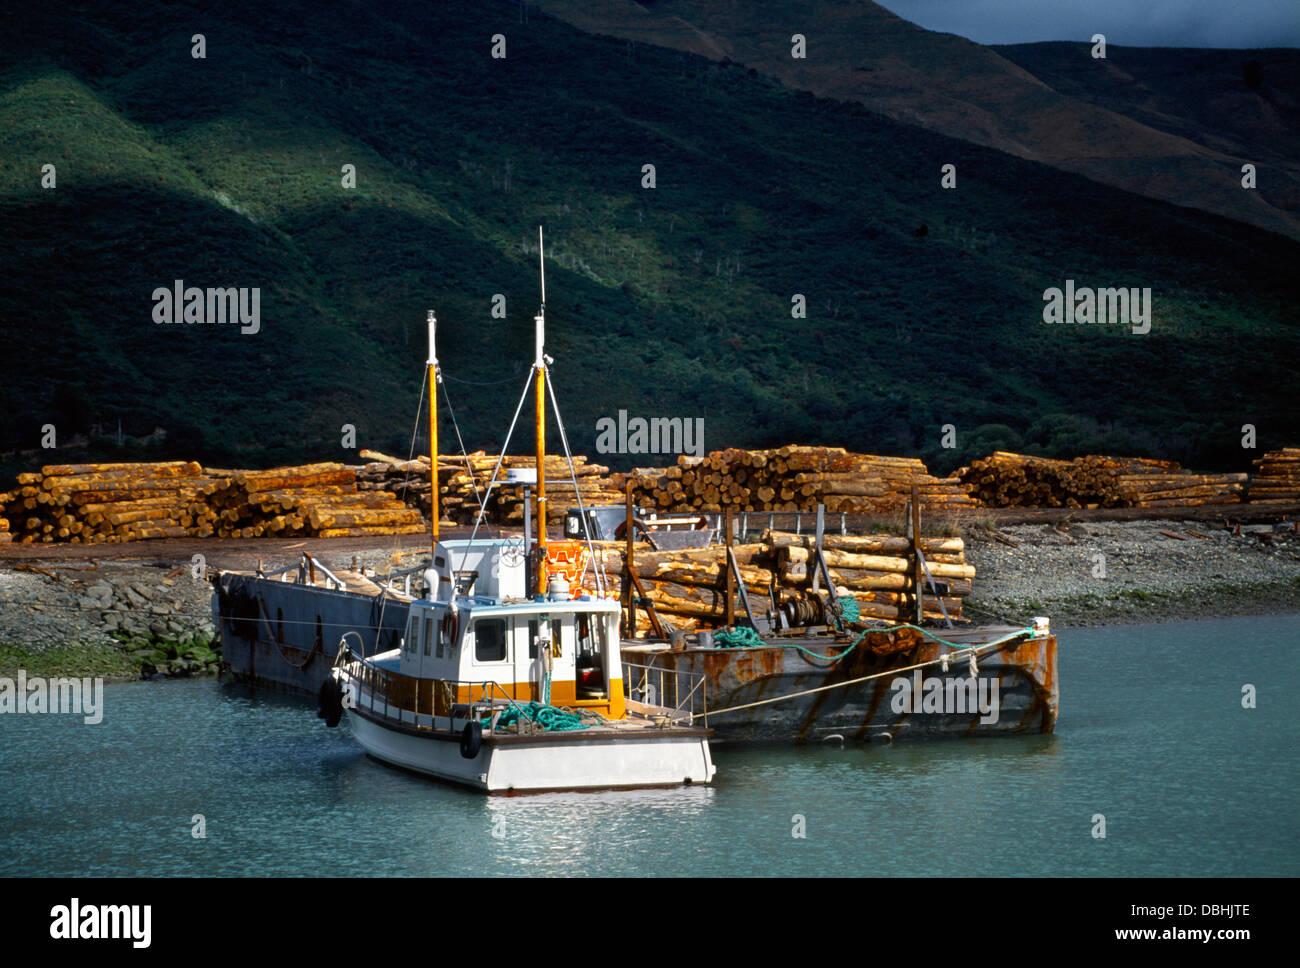 New Zealand Havelock Timber Exports - Stock Image